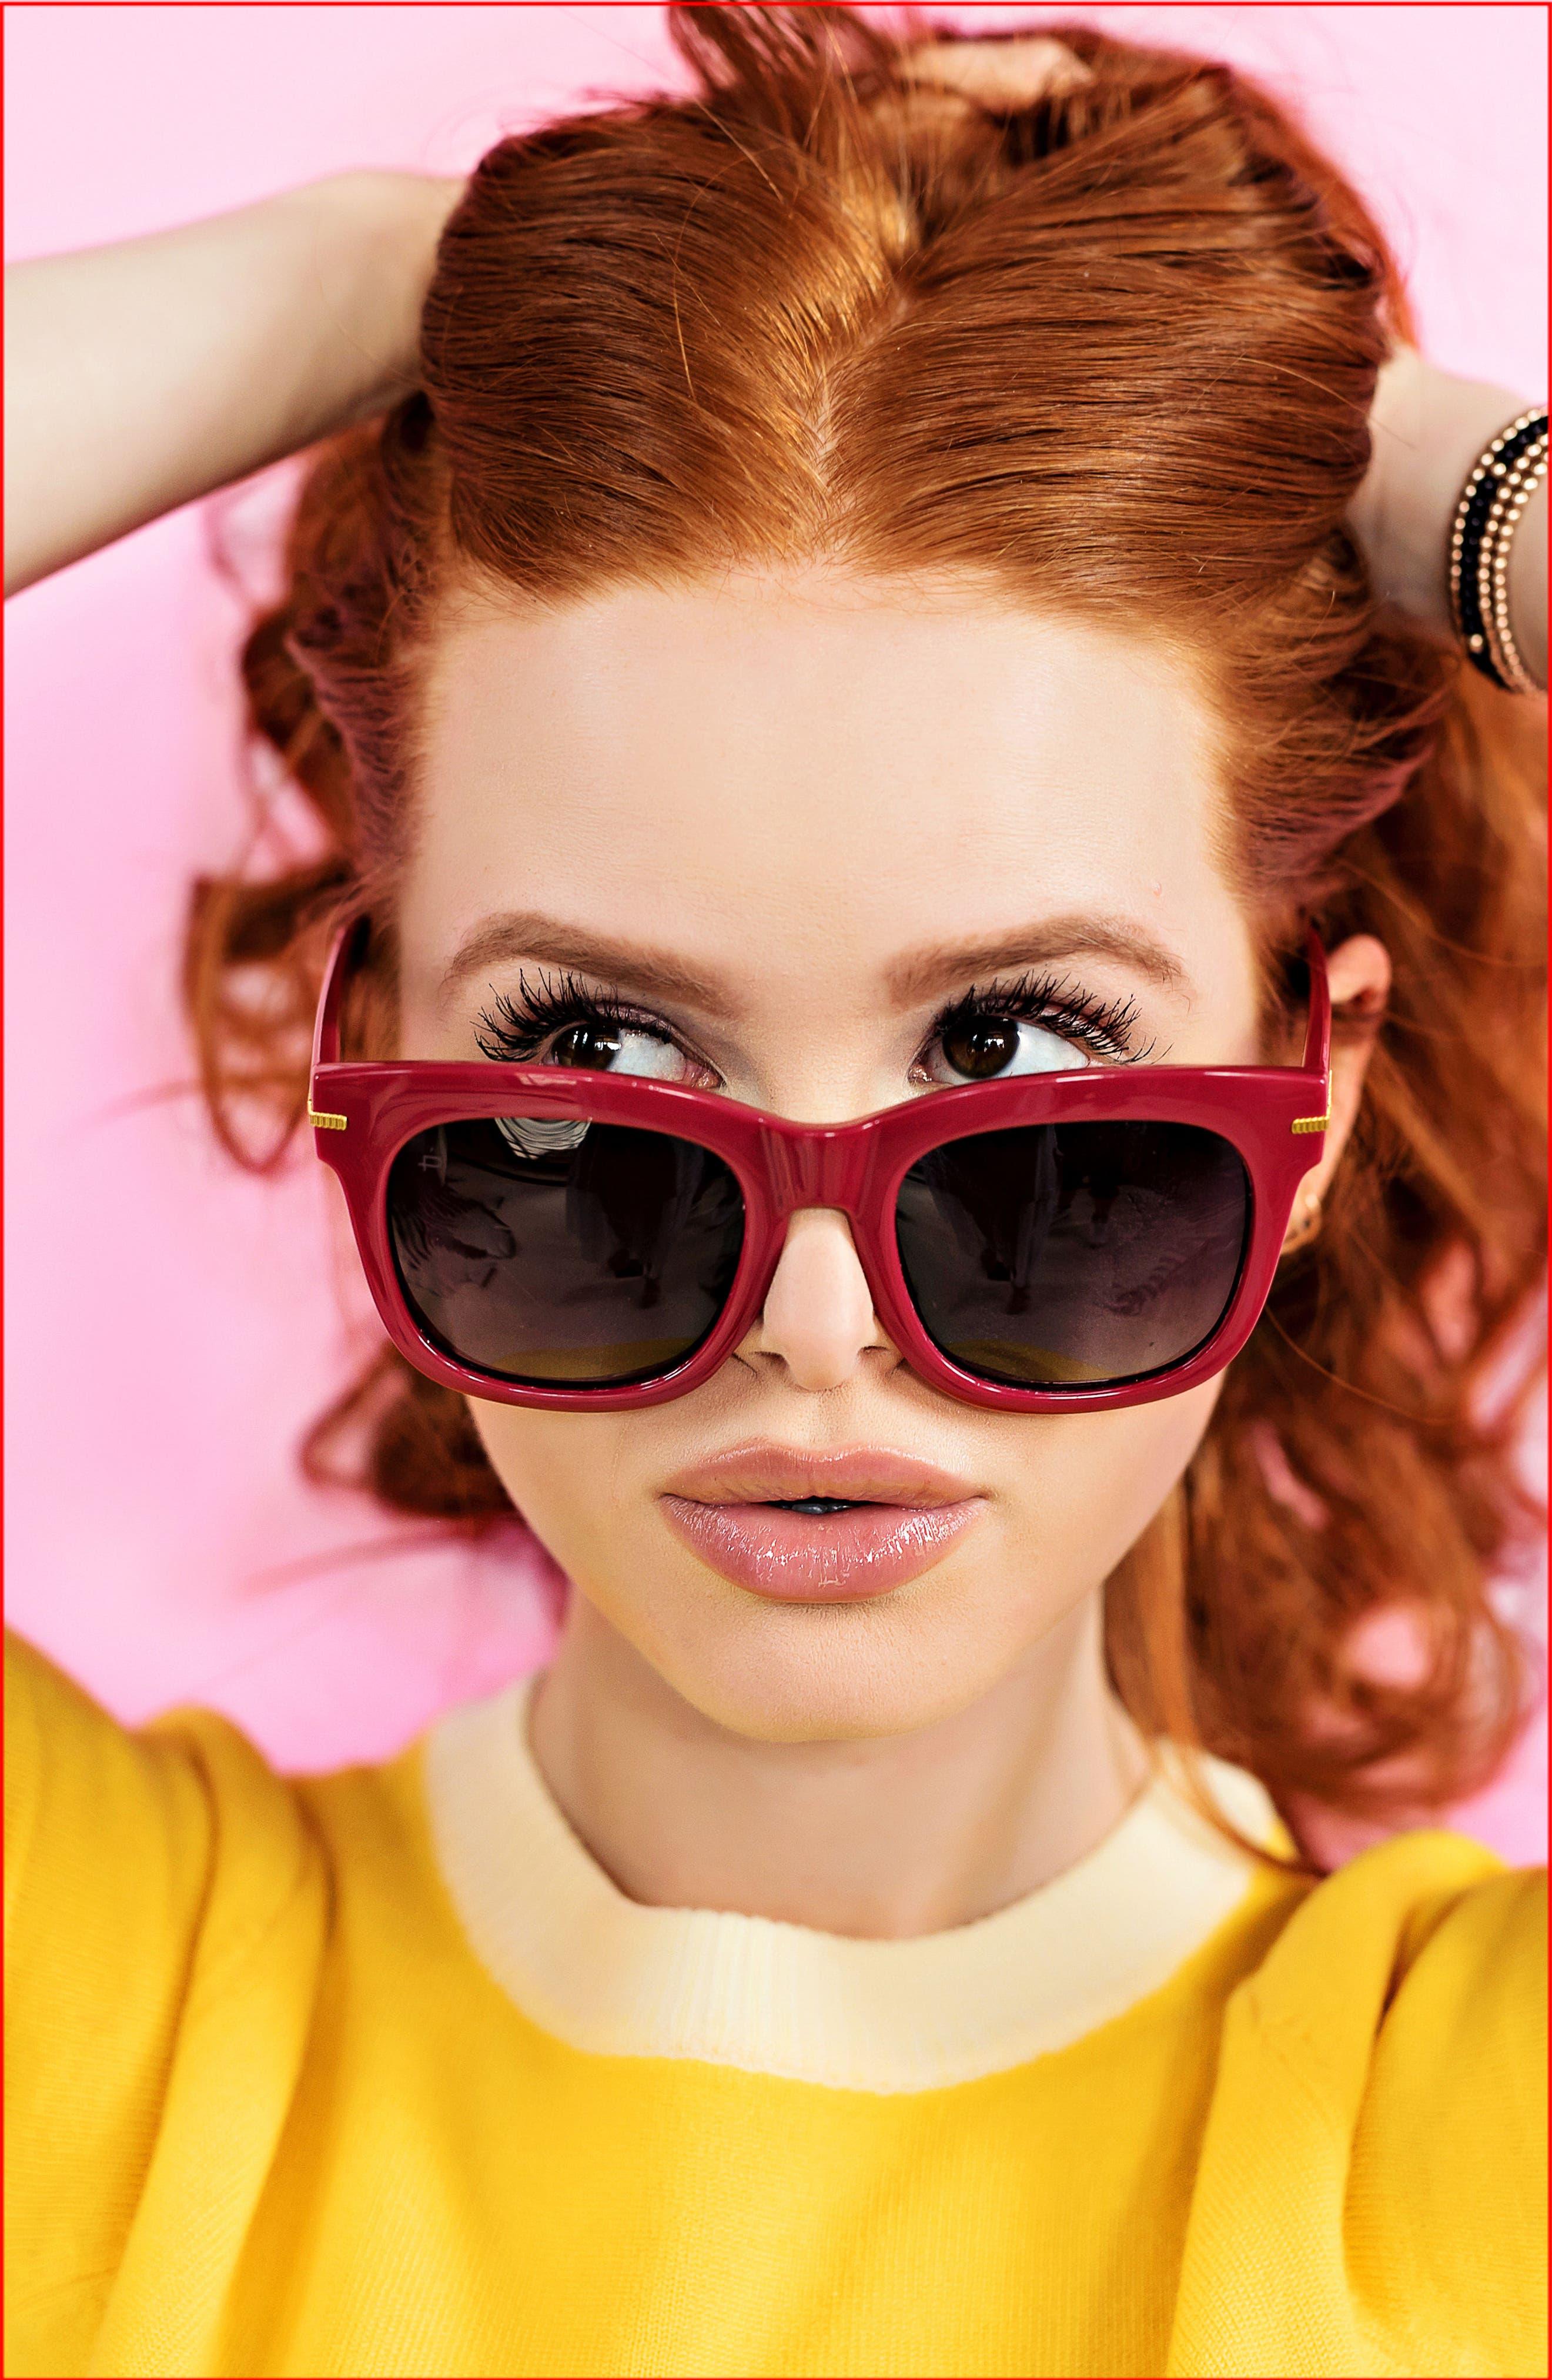 Privé Revaux x Madelaine Petsch The Clique 52mm Square Sunglasses,                             Alternate thumbnail 4, color,                             RED